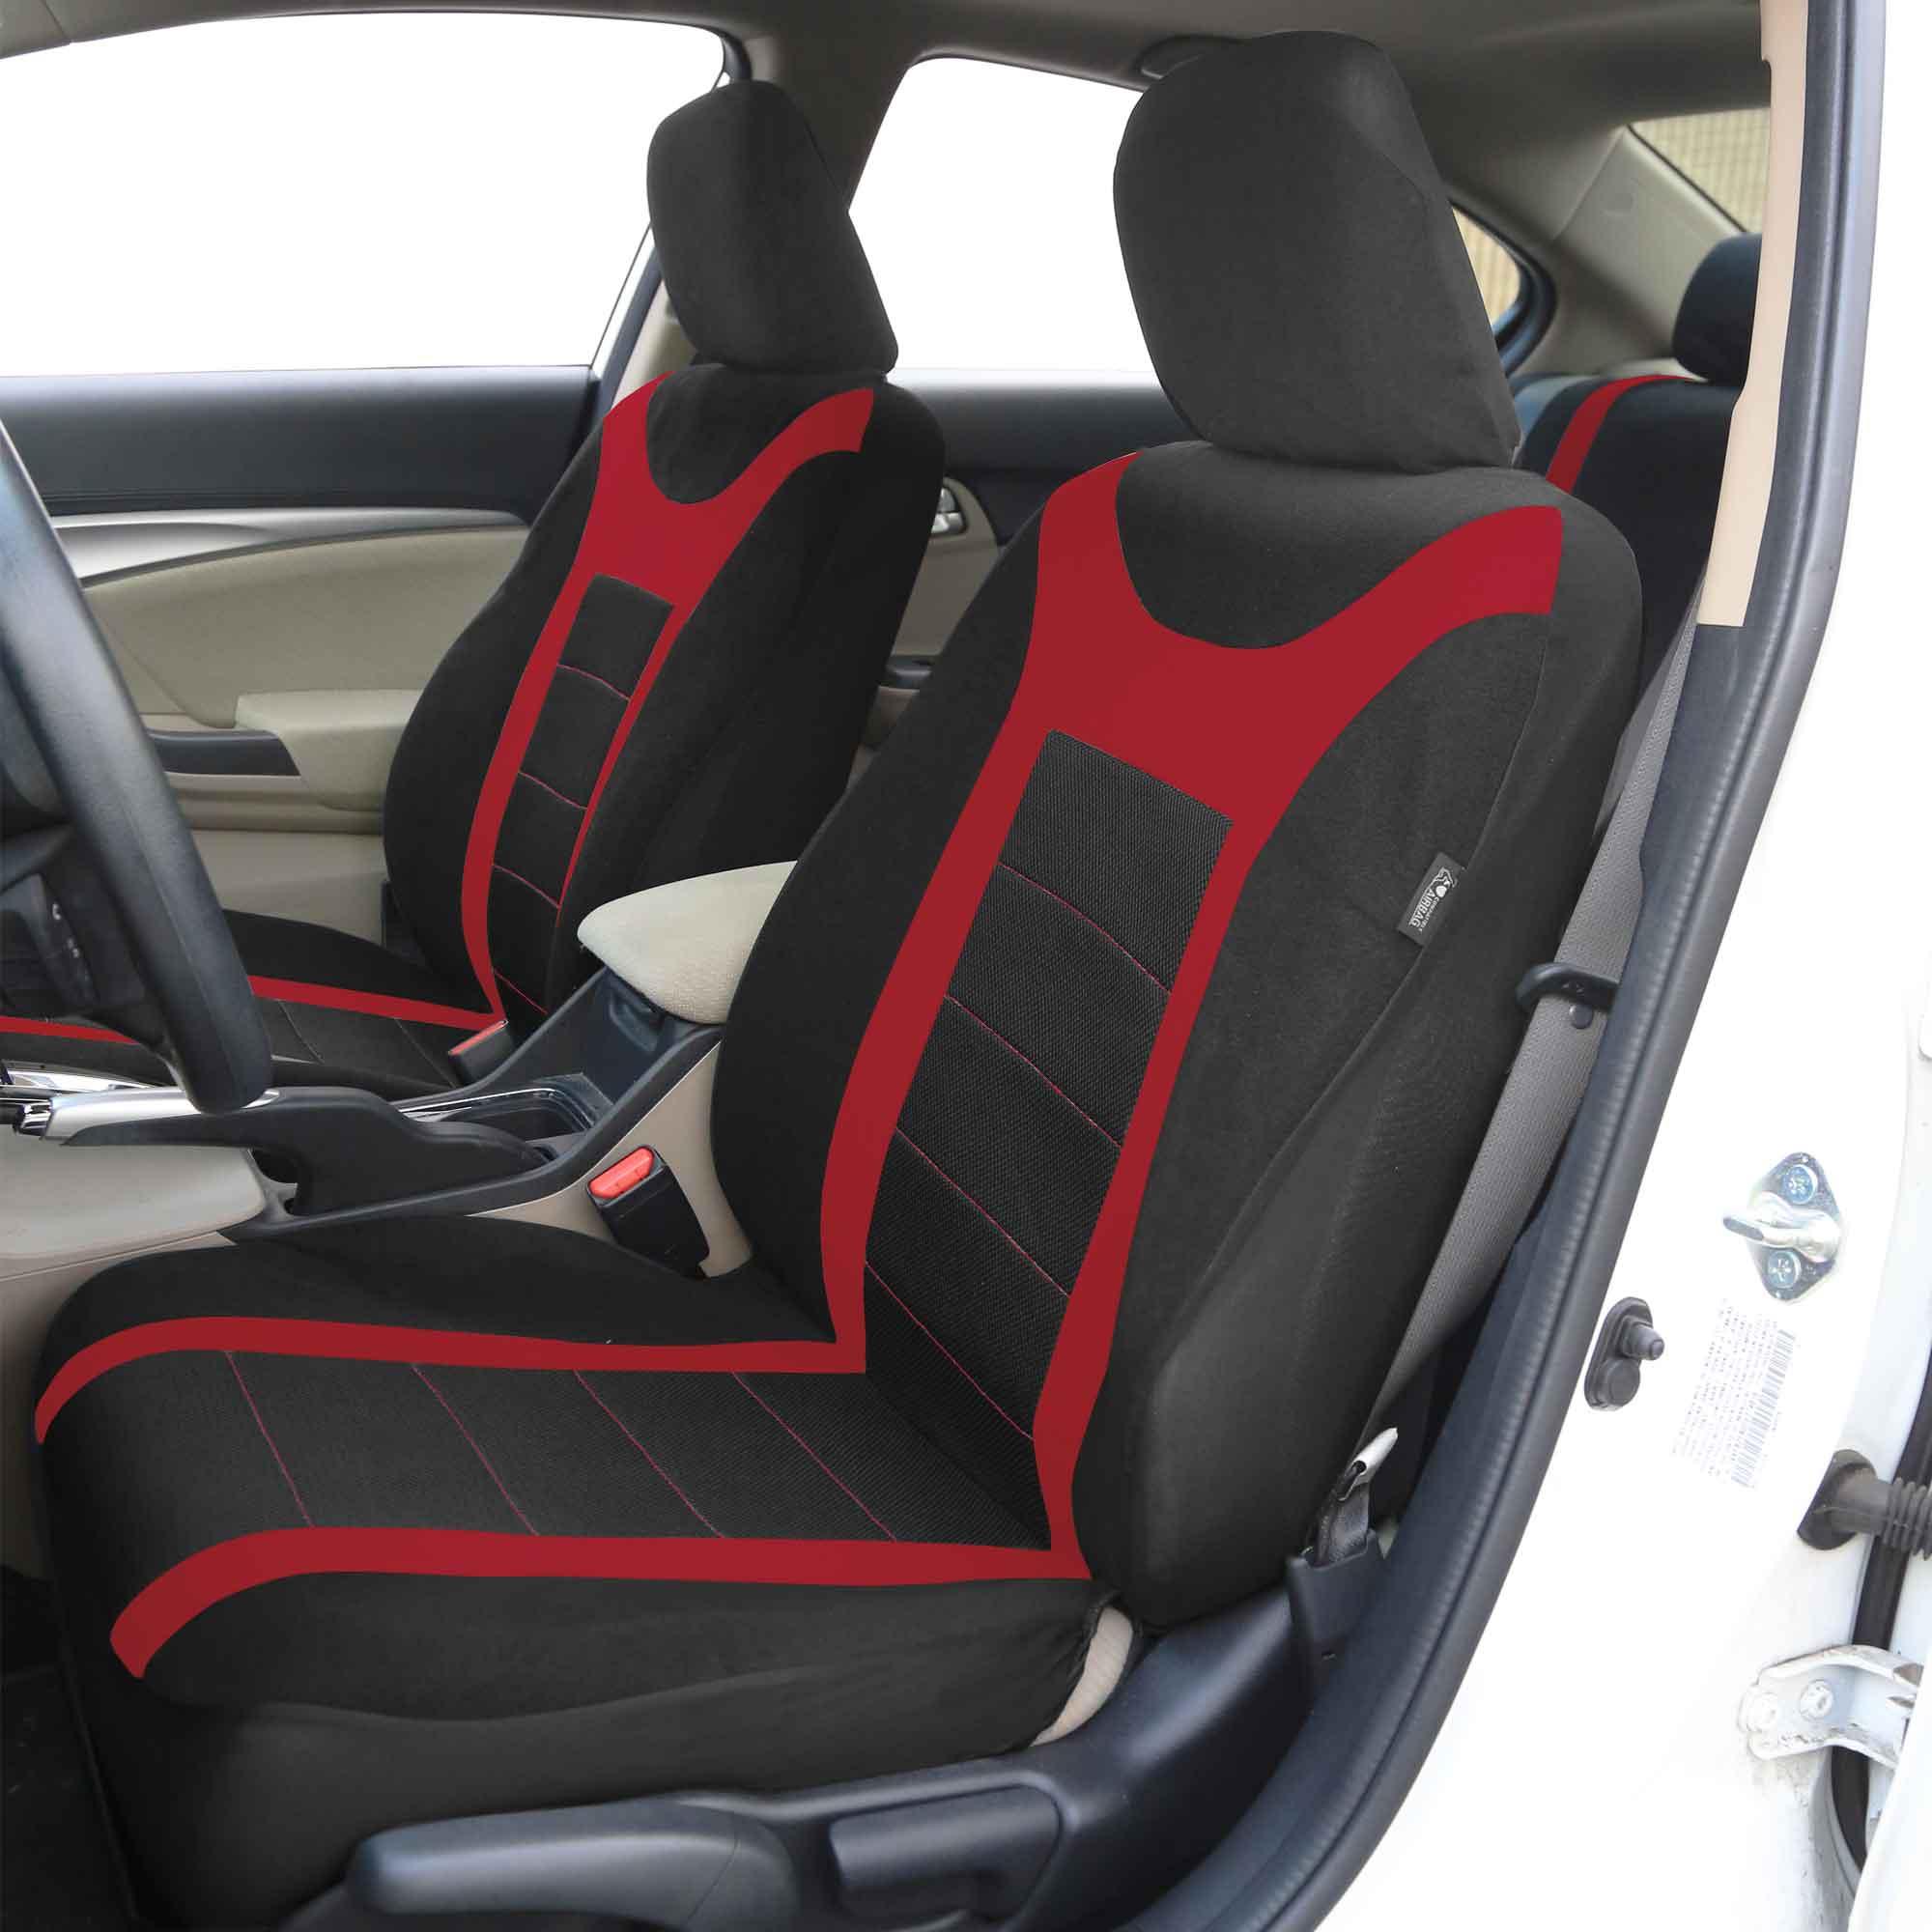 sports car seat covers complete set air bag safe split bench ready ebay. Black Bedroom Furniture Sets. Home Design Ideas